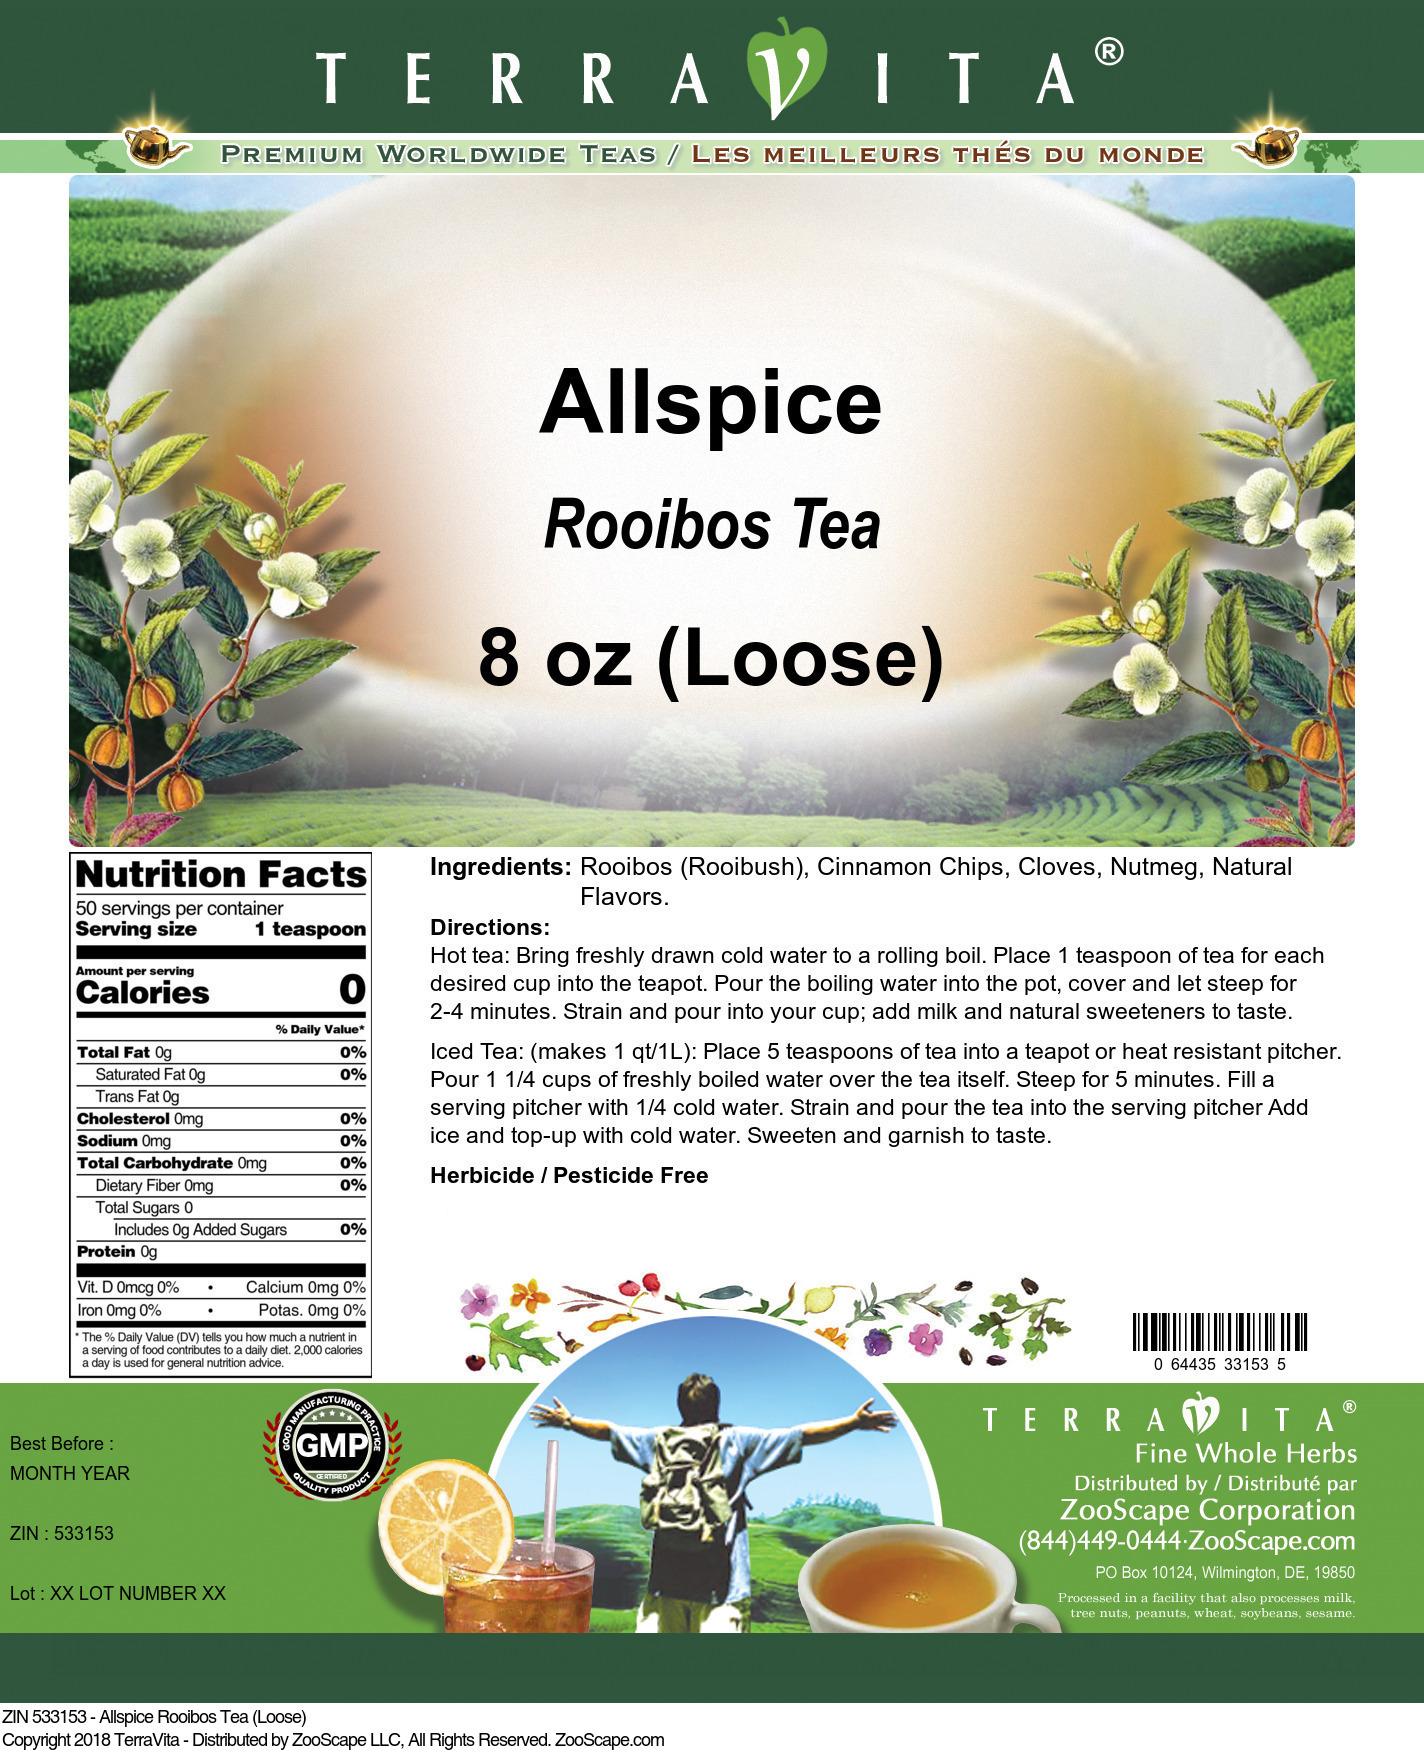 Allspice Rooibos Tea